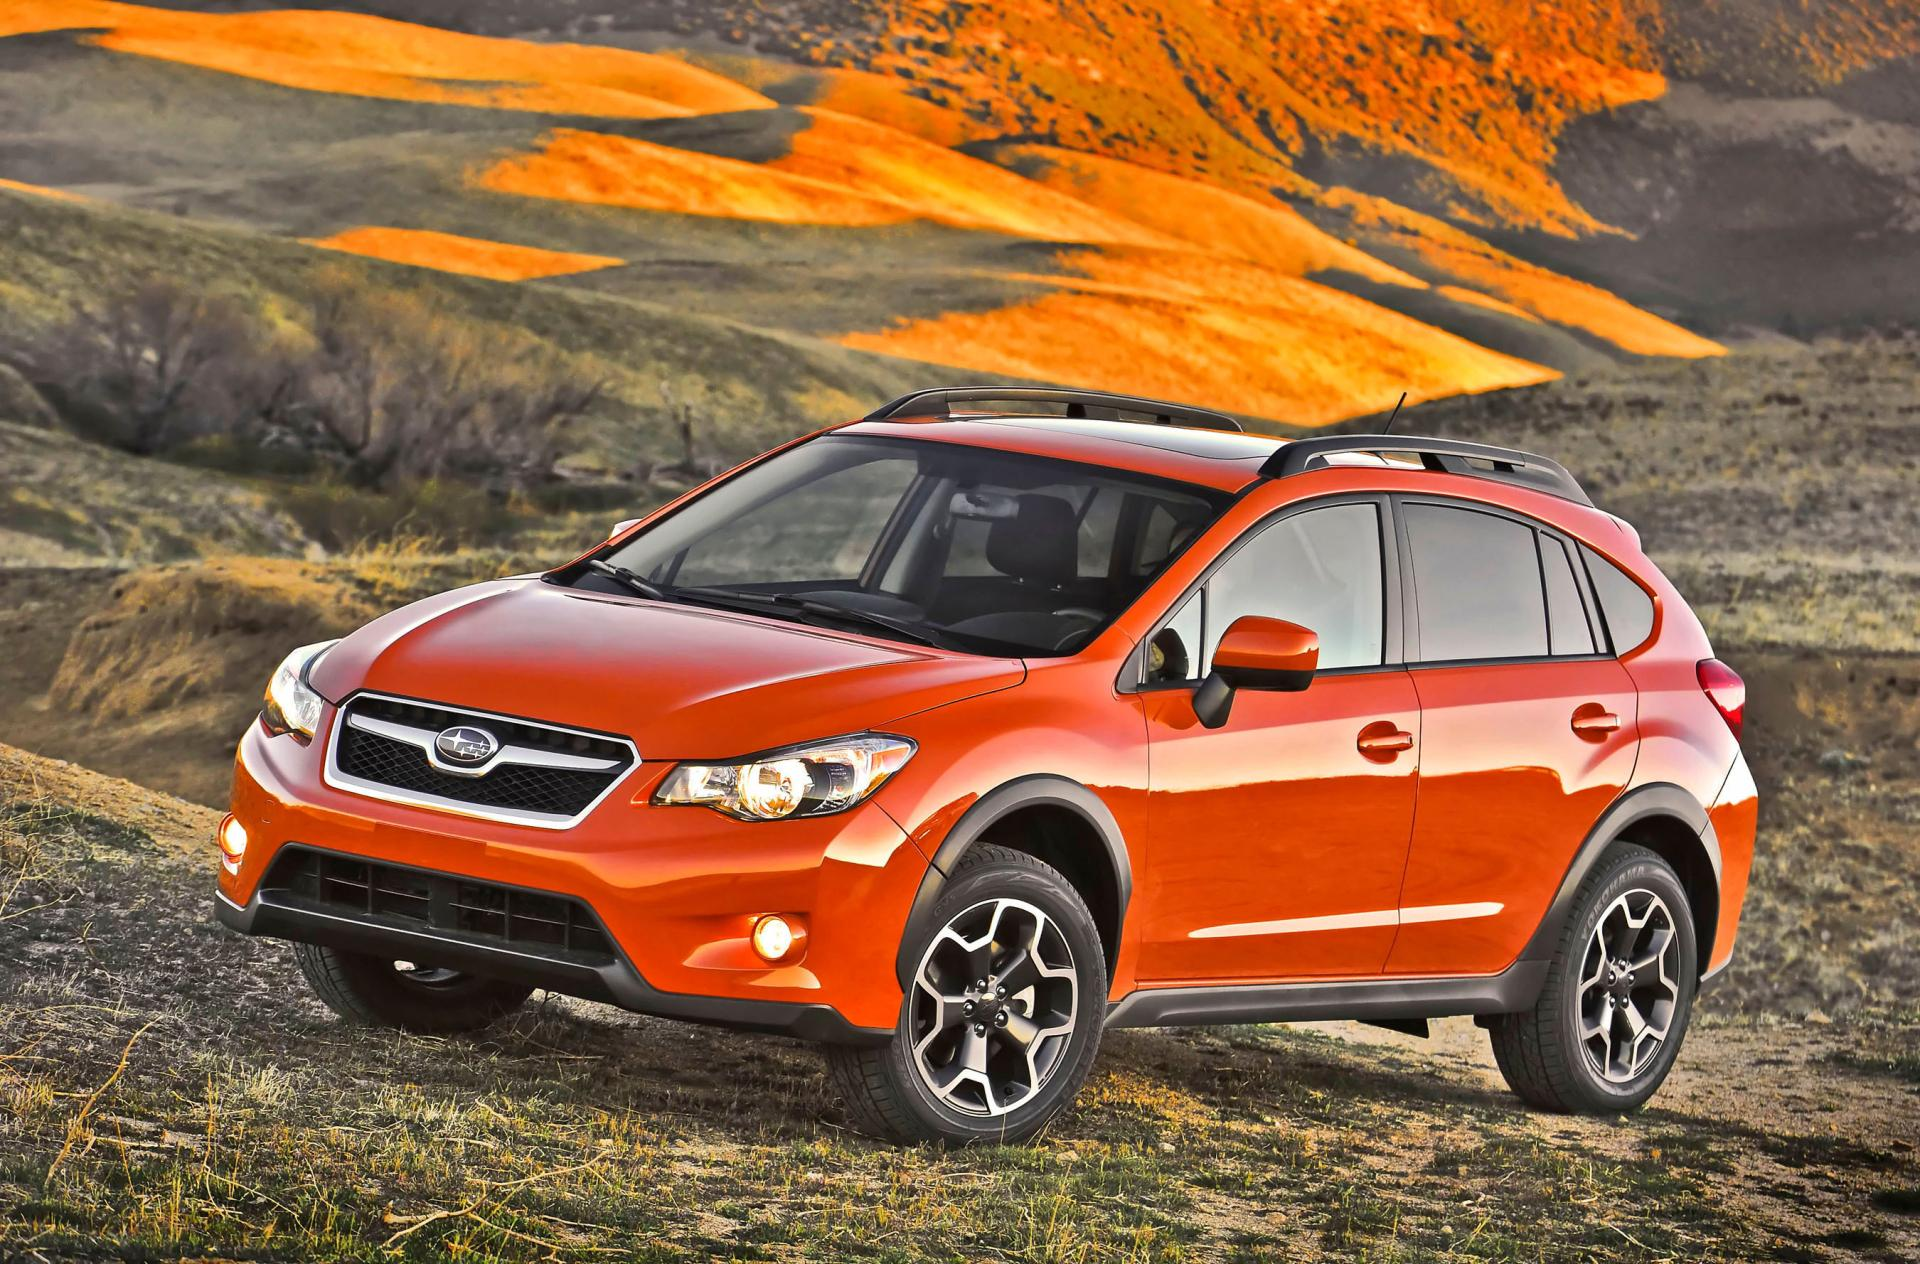 2013 Subaru XV Crosstrek News and Information